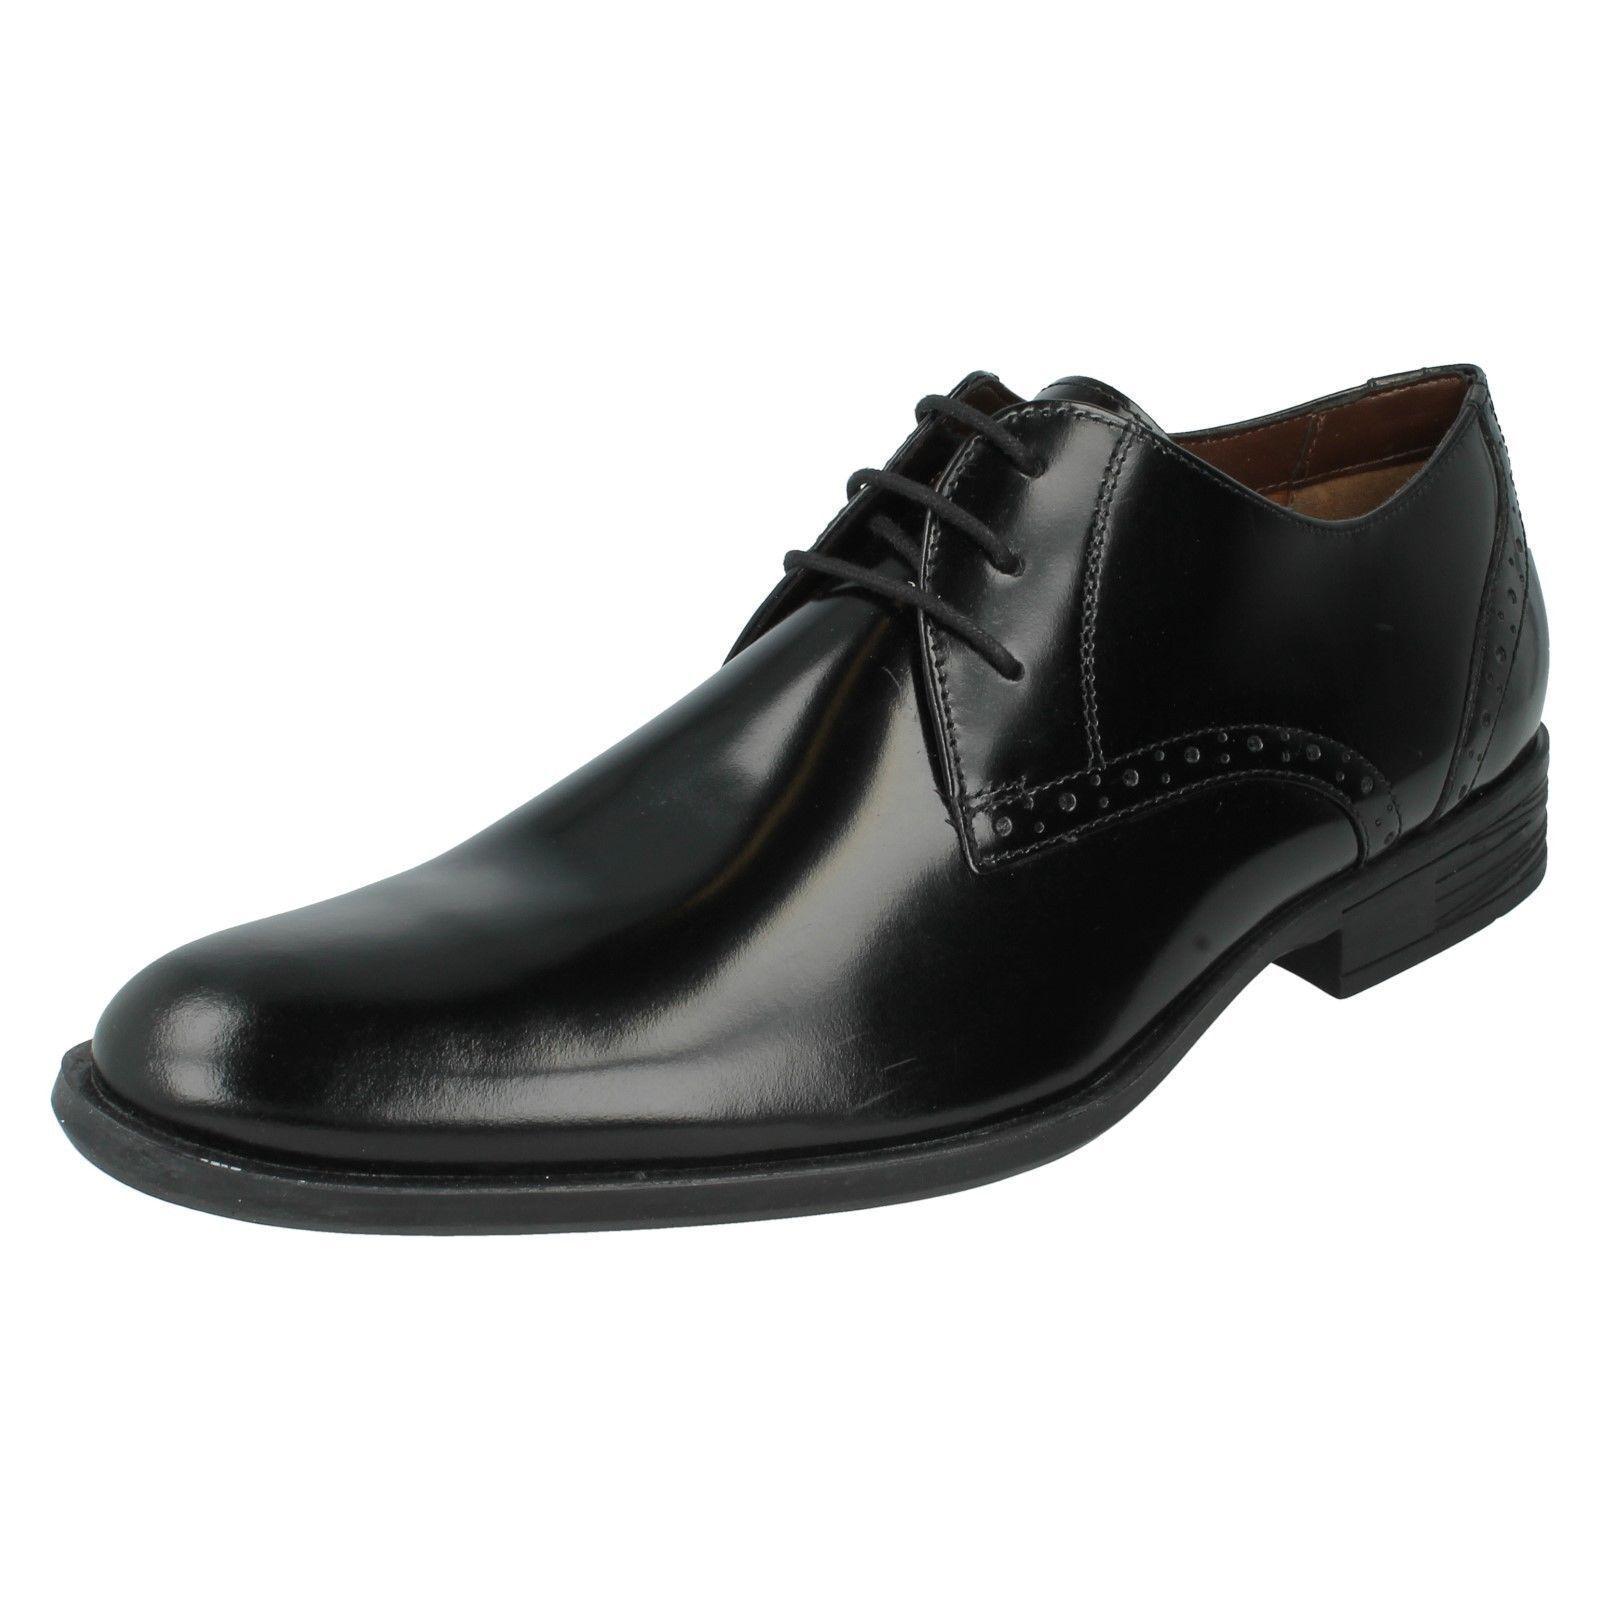 Hush Puppies Kensington Mens Black Polished Leather Wide Fitt Shoes (R19B)